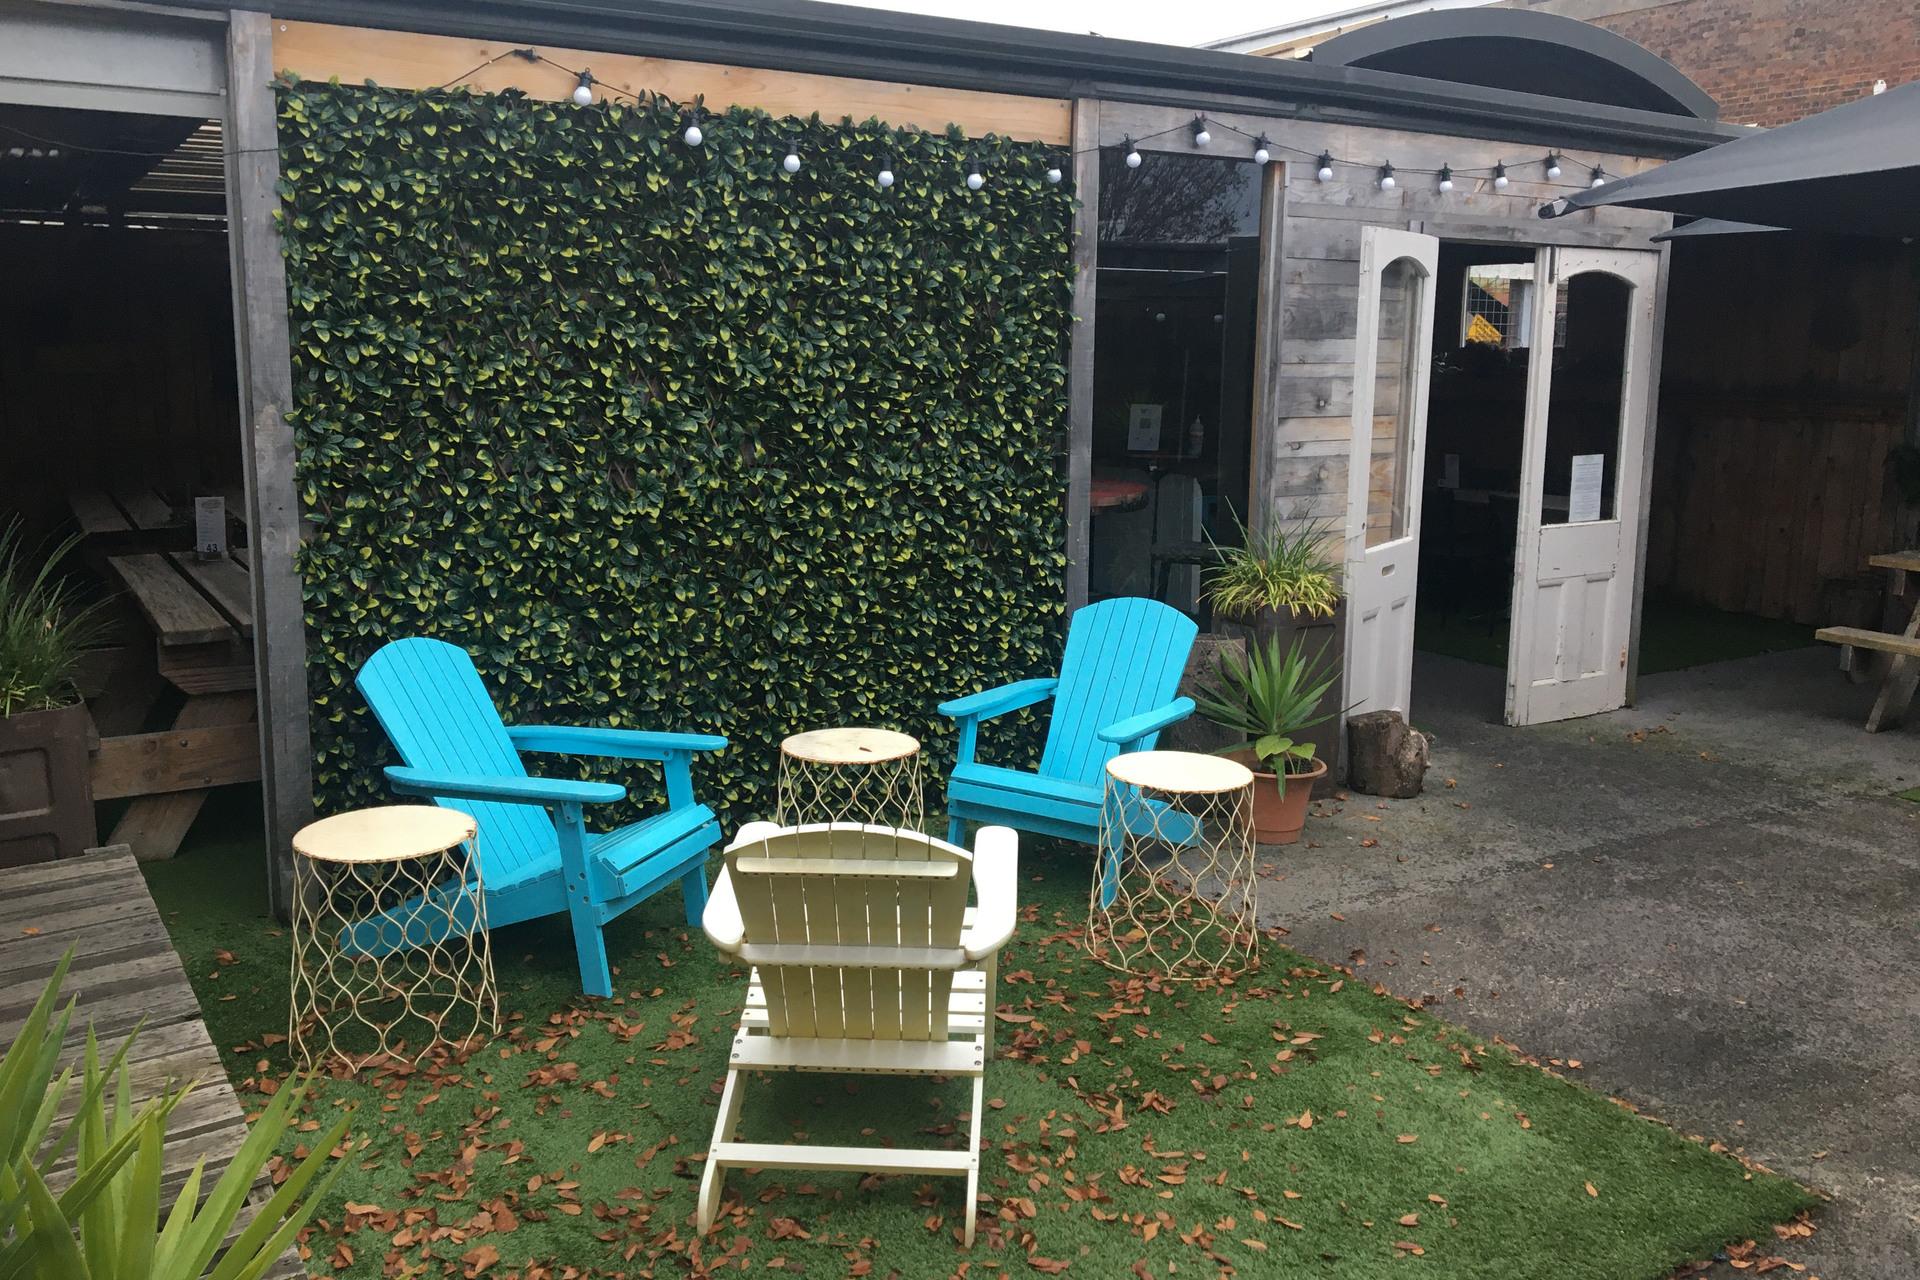 c - Culture Cafe Lounge Bar